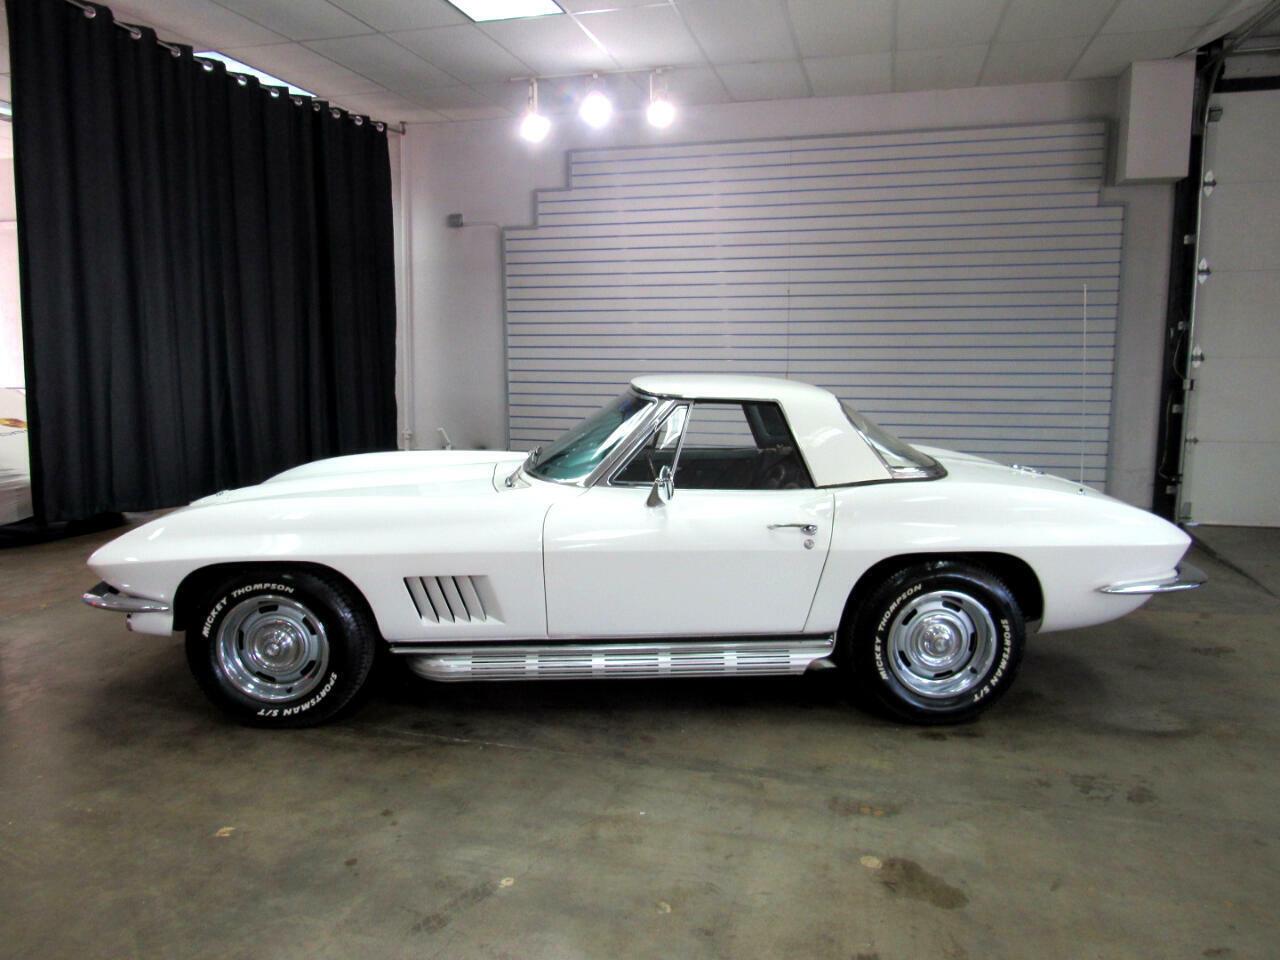 1967 White Chevrolet Corvette Convertible  | C2 Corvette Photo 2